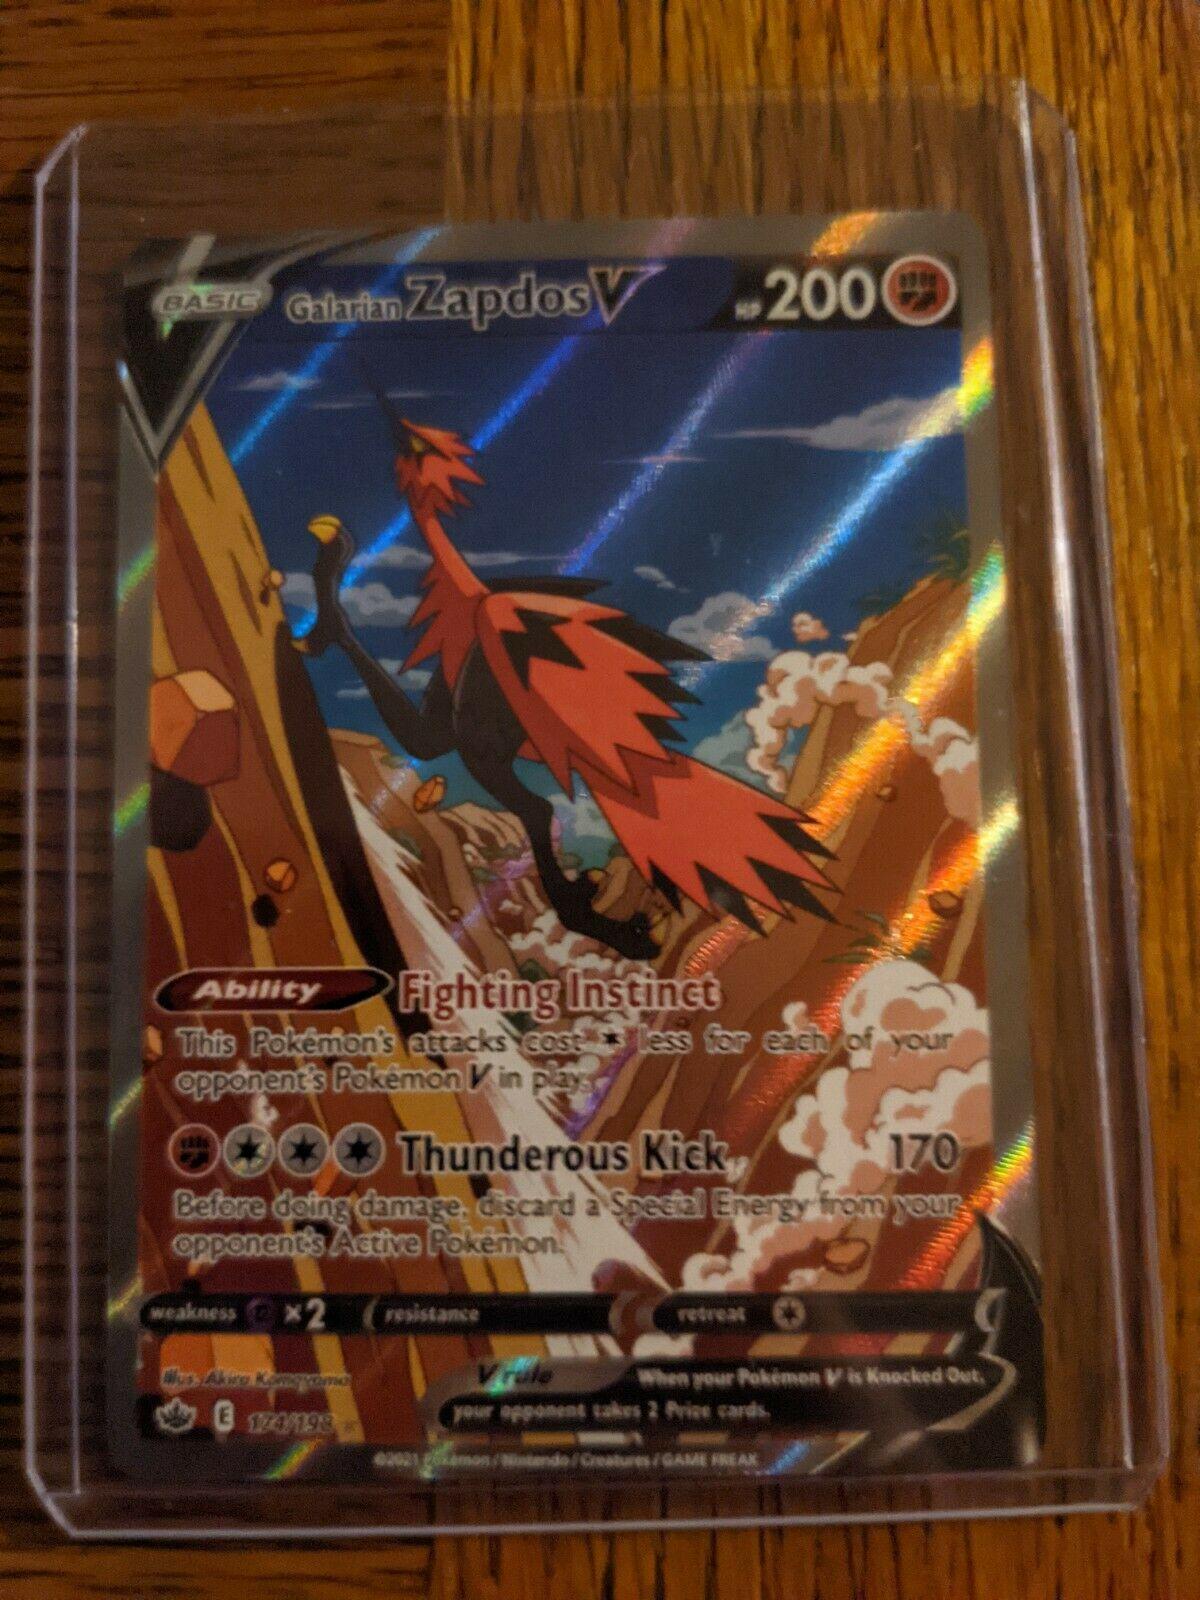 Galarian Zapdos V Alternate Art 174/198 Chilling Reign Pokemon Card